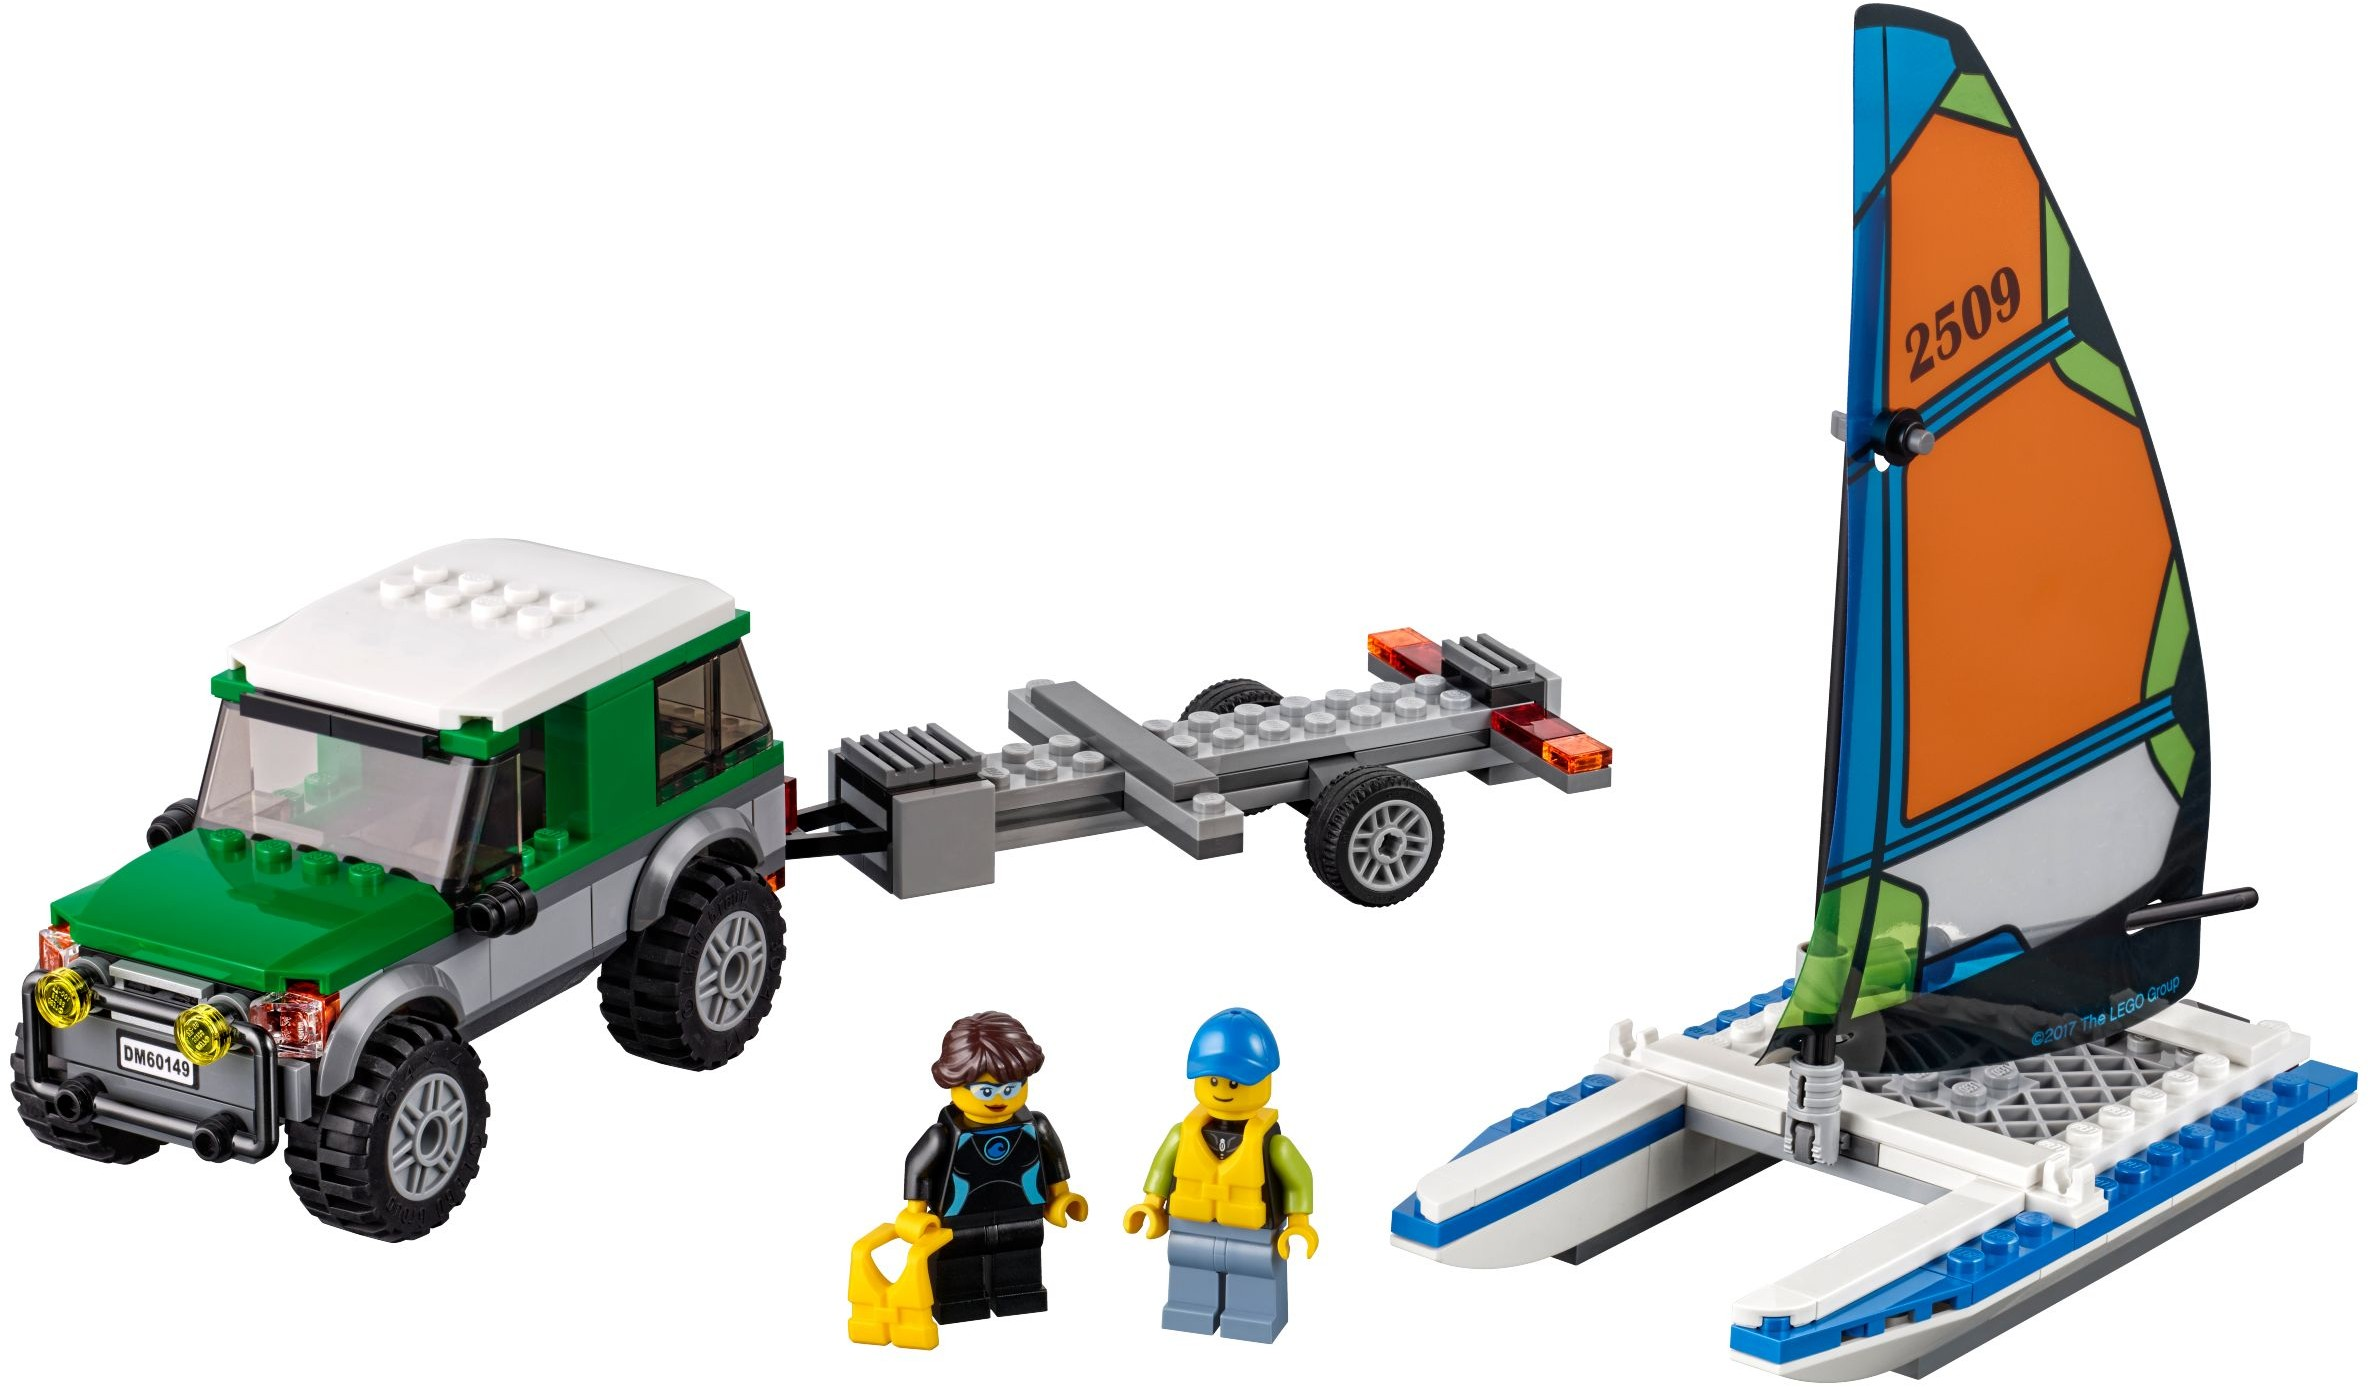 Mua đồ chơi LEGO 60149 - LEGO City 60149 - Xe Tải chở Thuyền Catamaran (LEGO City 4x4 with Catamaran 60149)